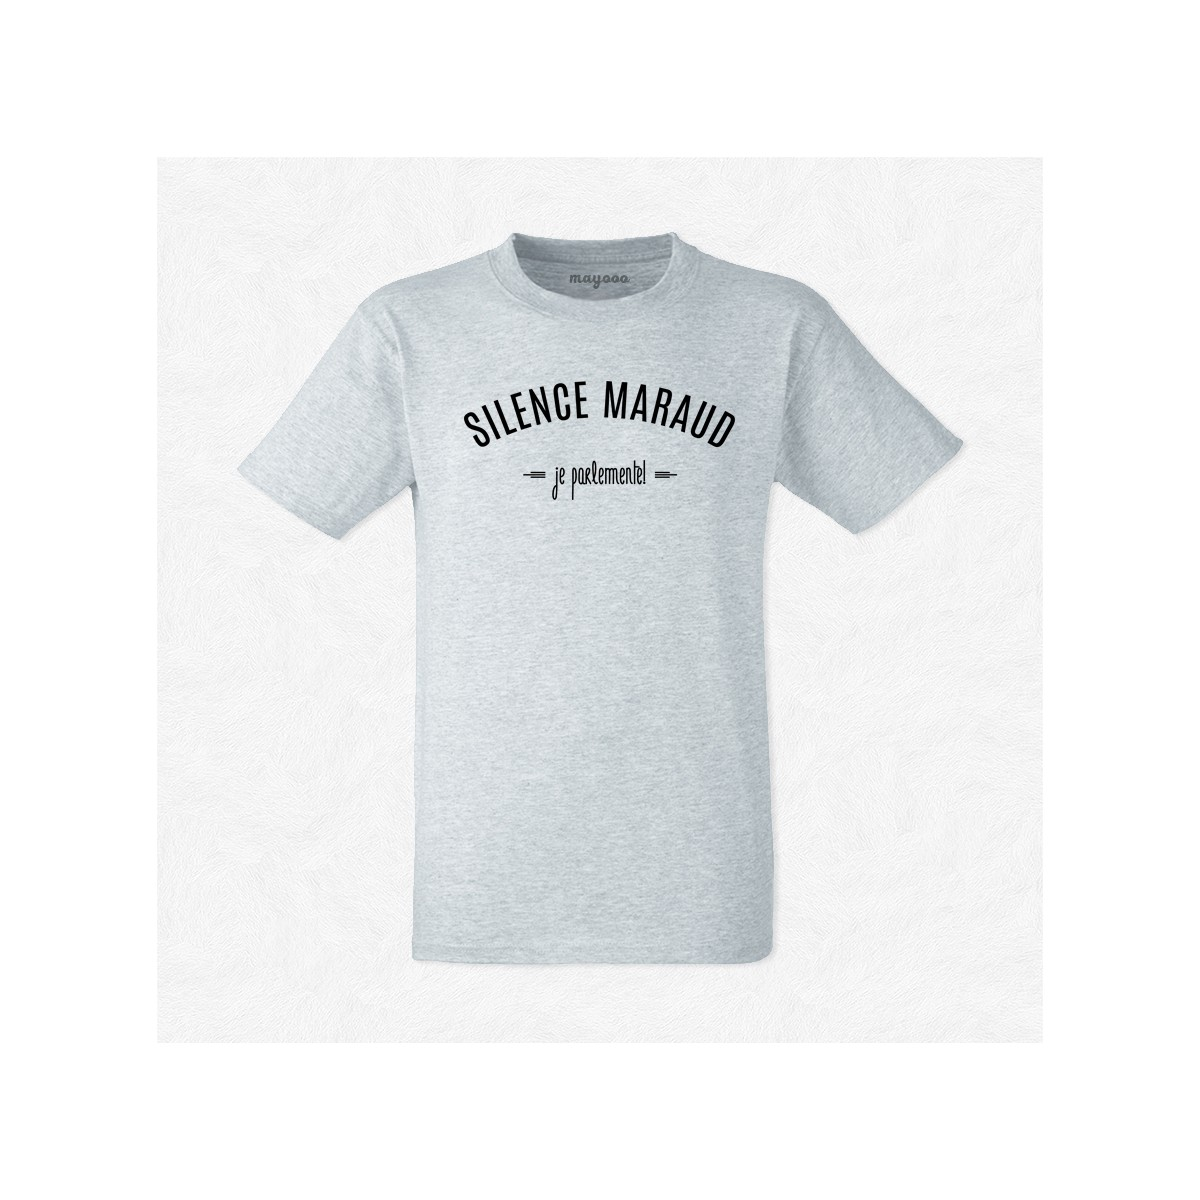 T-shirt Silence maraud, je parlemente